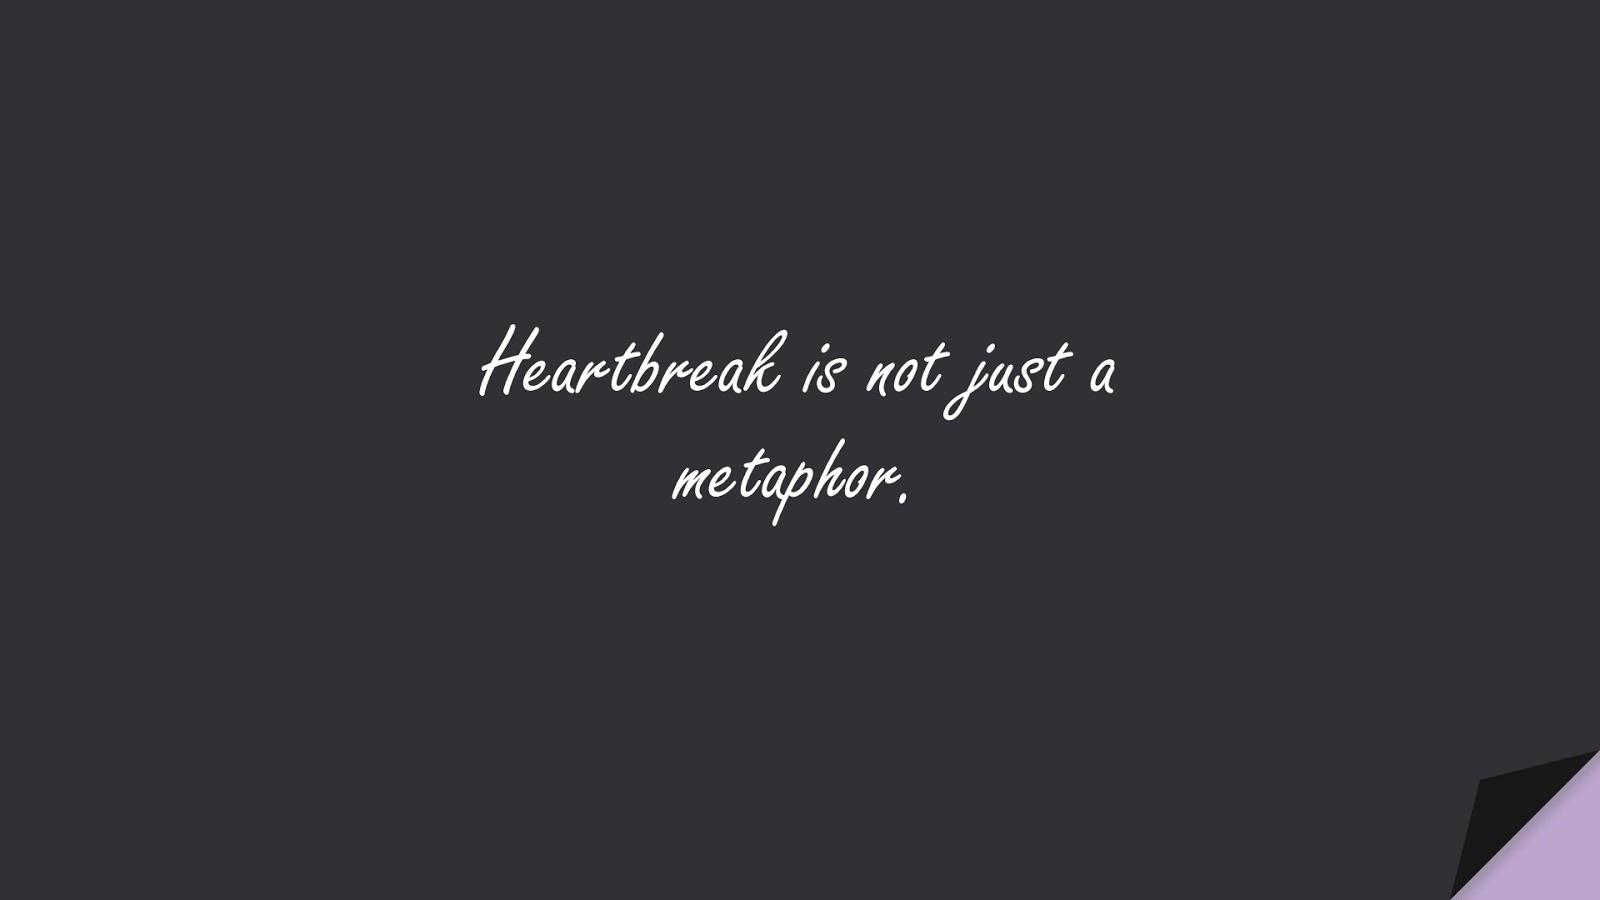 Heartbreak is not just a metaphor.FALSE